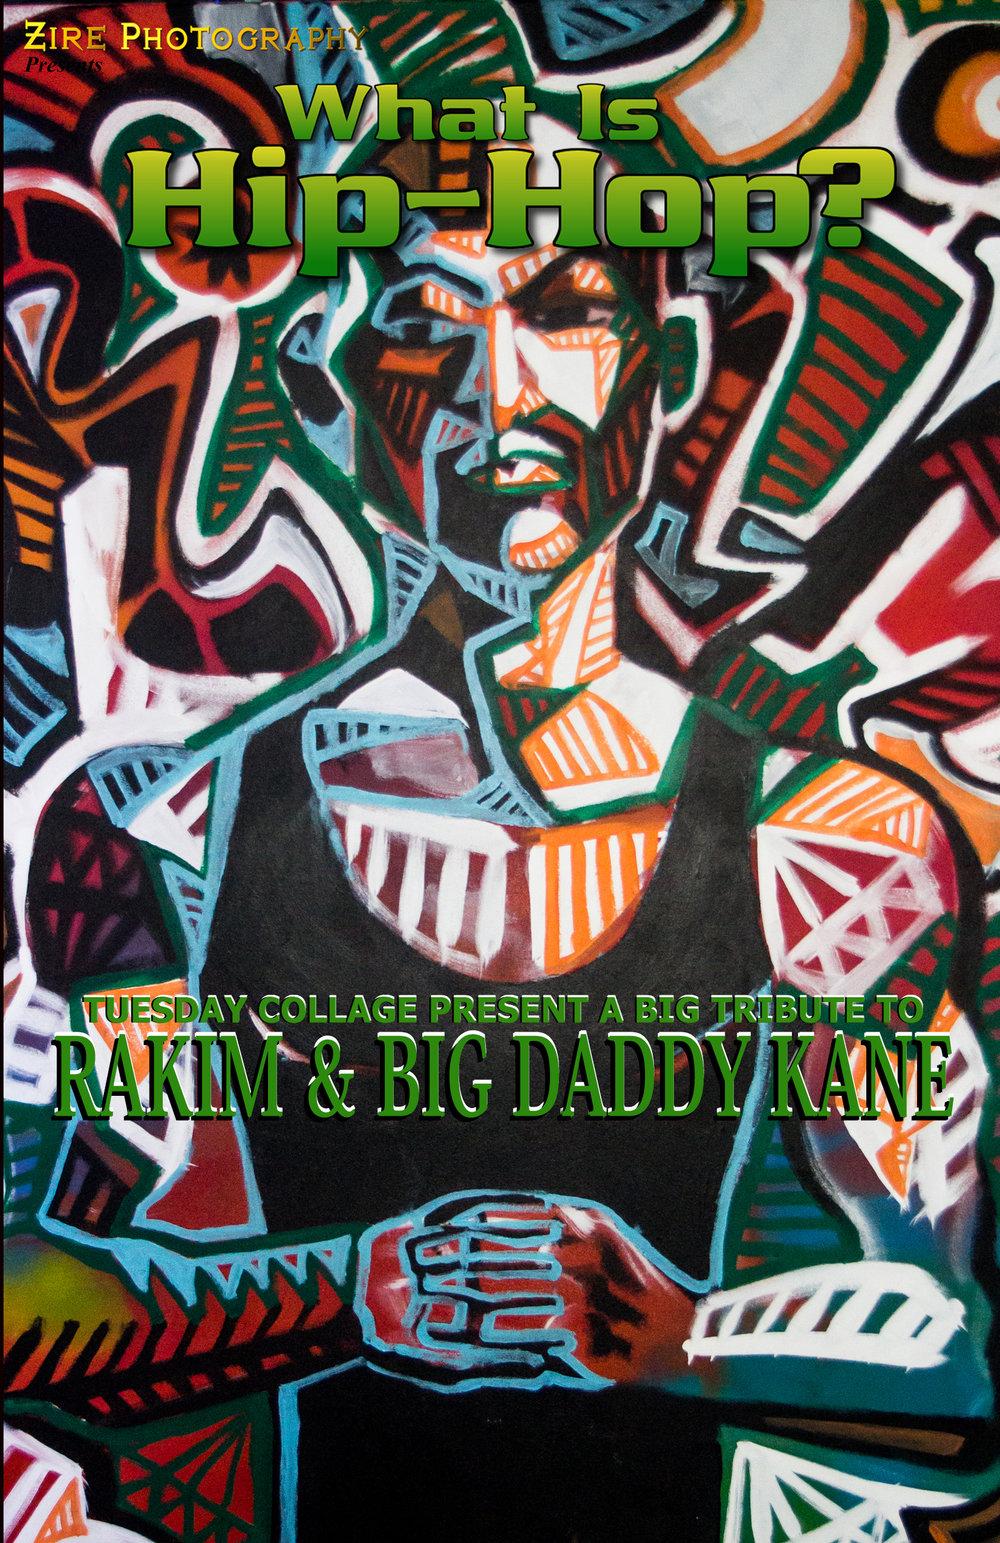 TUESDAY COLLAGE PRESENT A BIG TRIBUTE TO RAKIM and BIG DADDY KANE LIVE ART!!